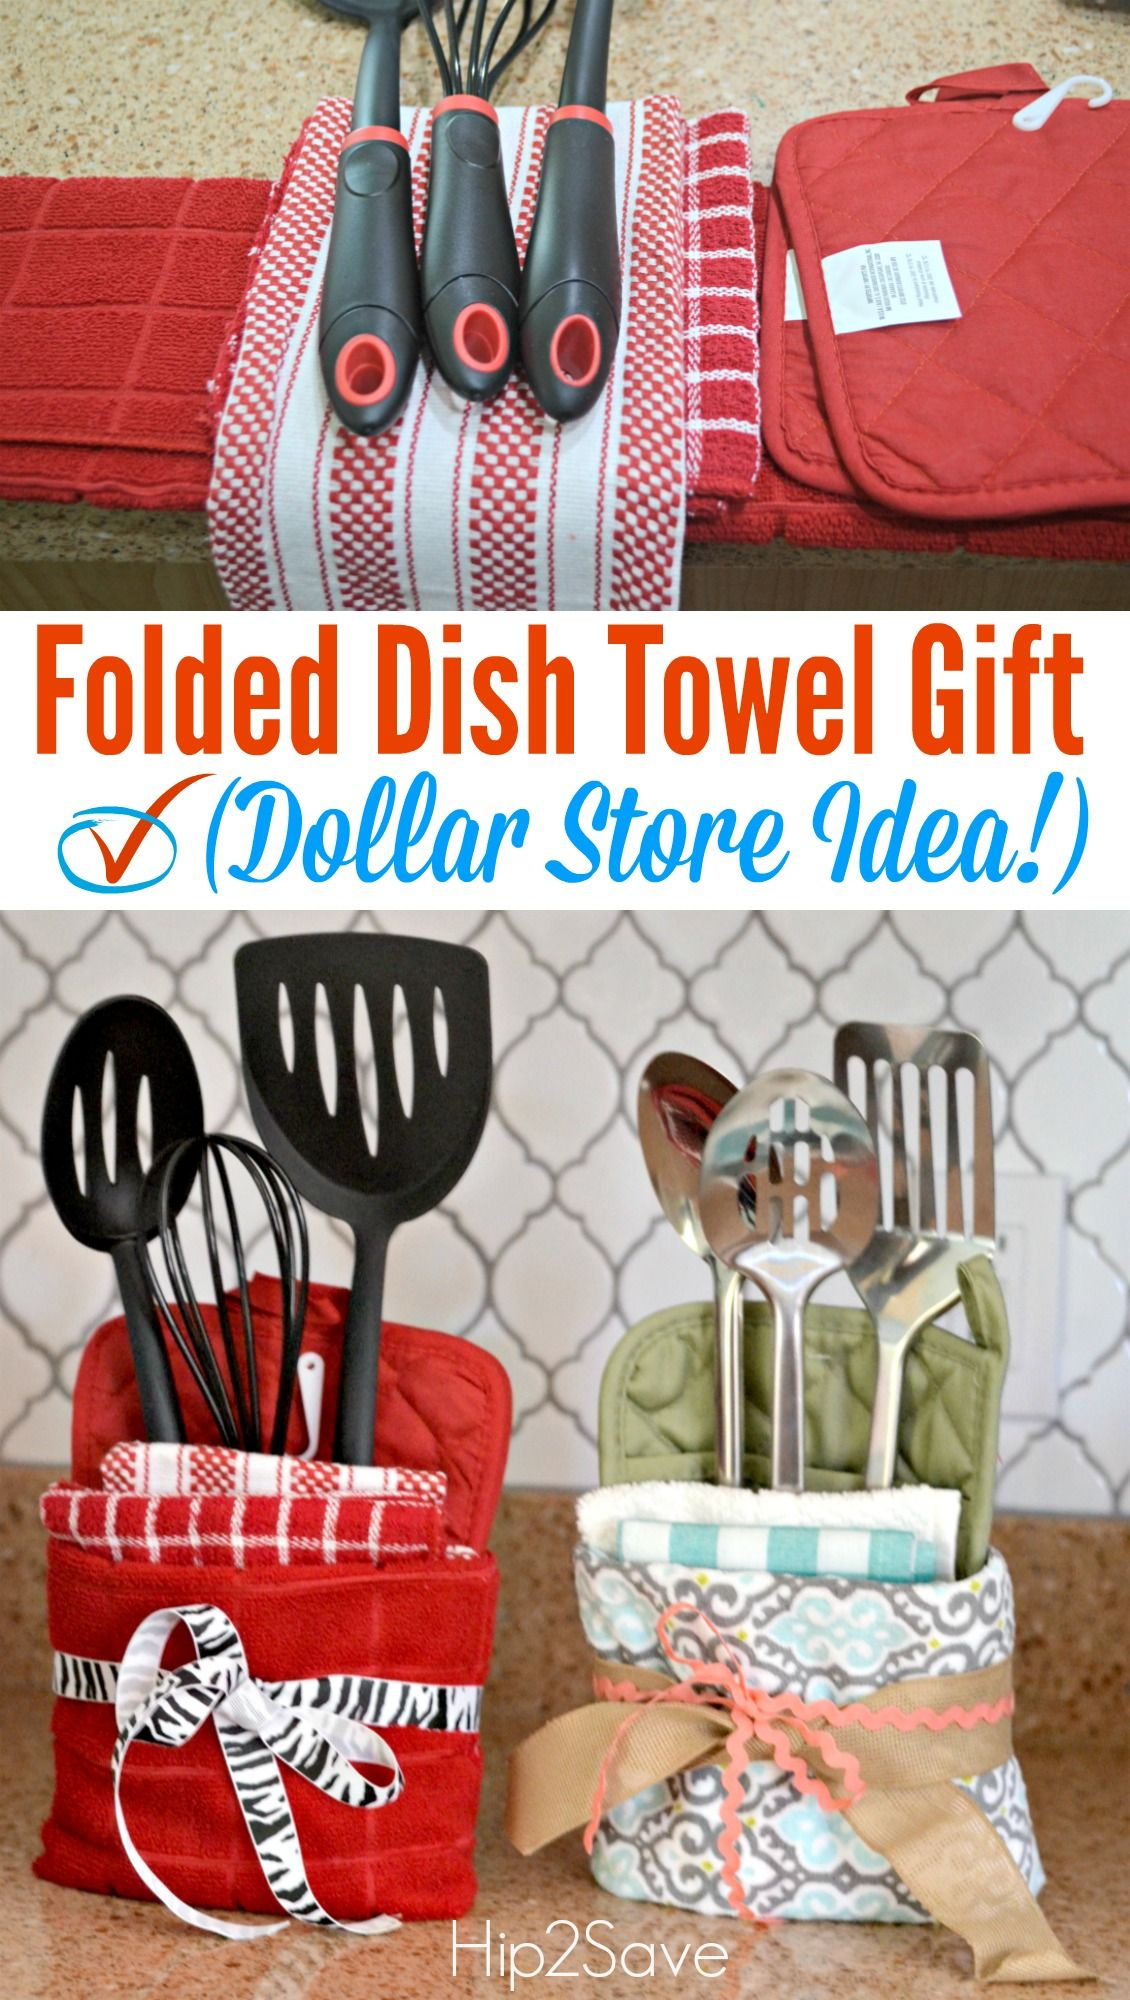 Easy Dollar Tree Gift Idea Great For Housewarming